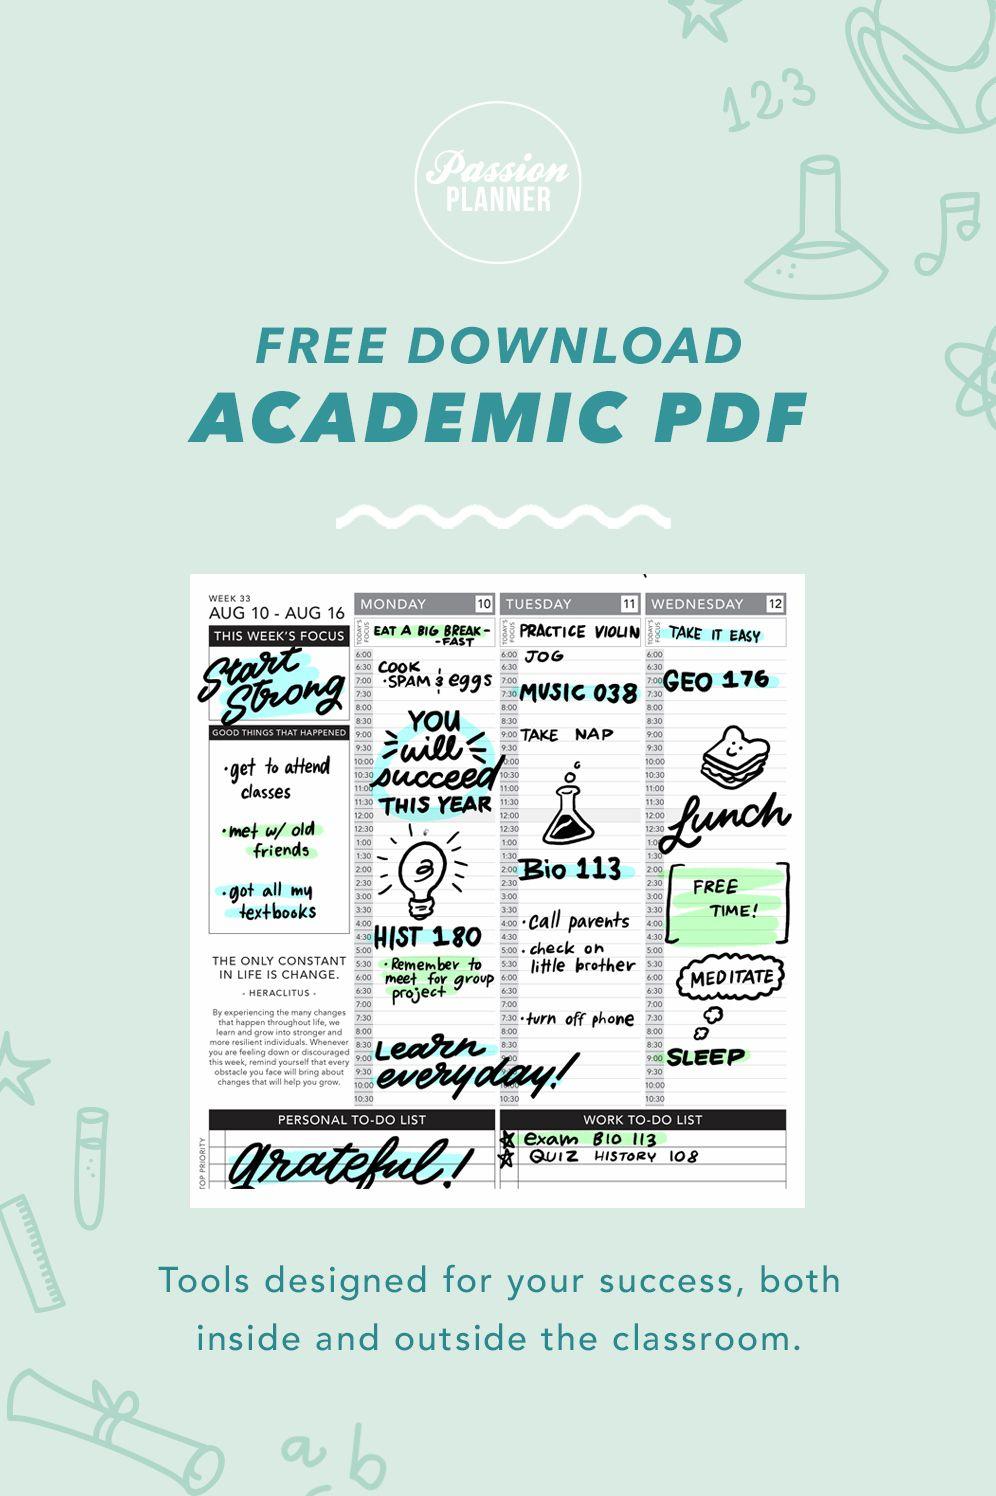 FREE Academic Planner PDF in 2020 Academic planner